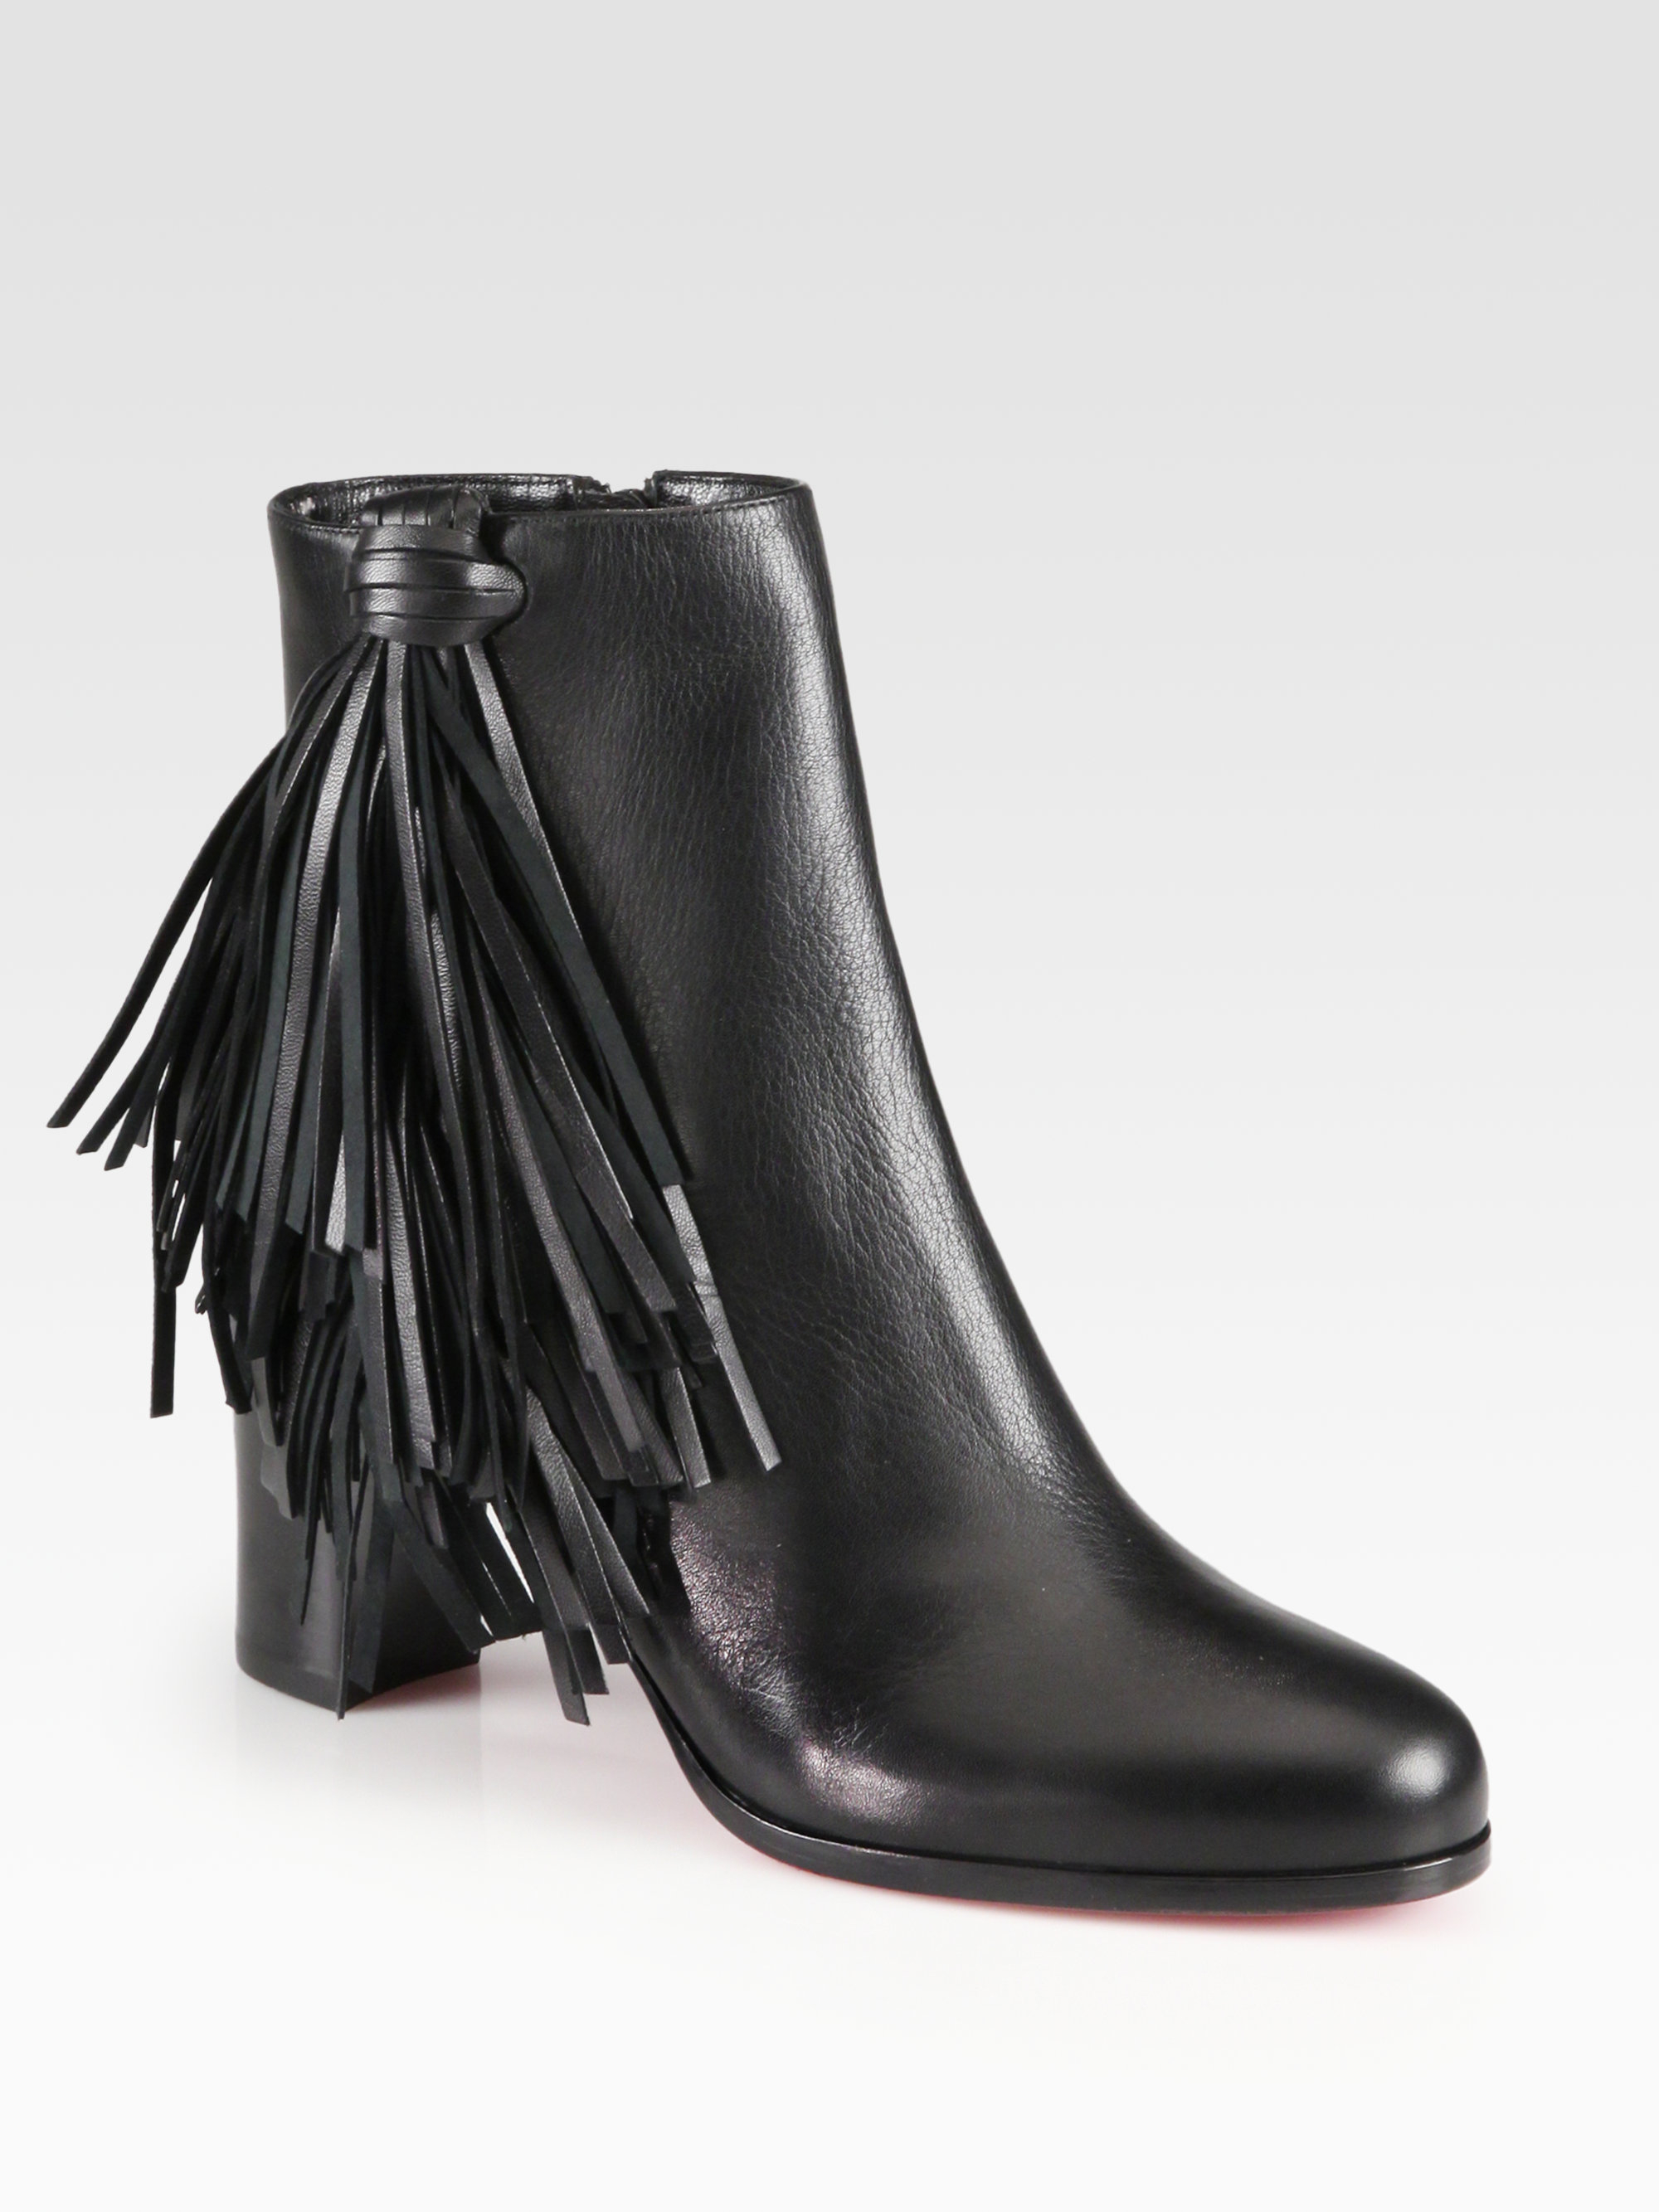 d17e96f2e799 ... ireland lyst christian louboutin jimmynetta fringe leather ankle boots  in 1299d 057f5